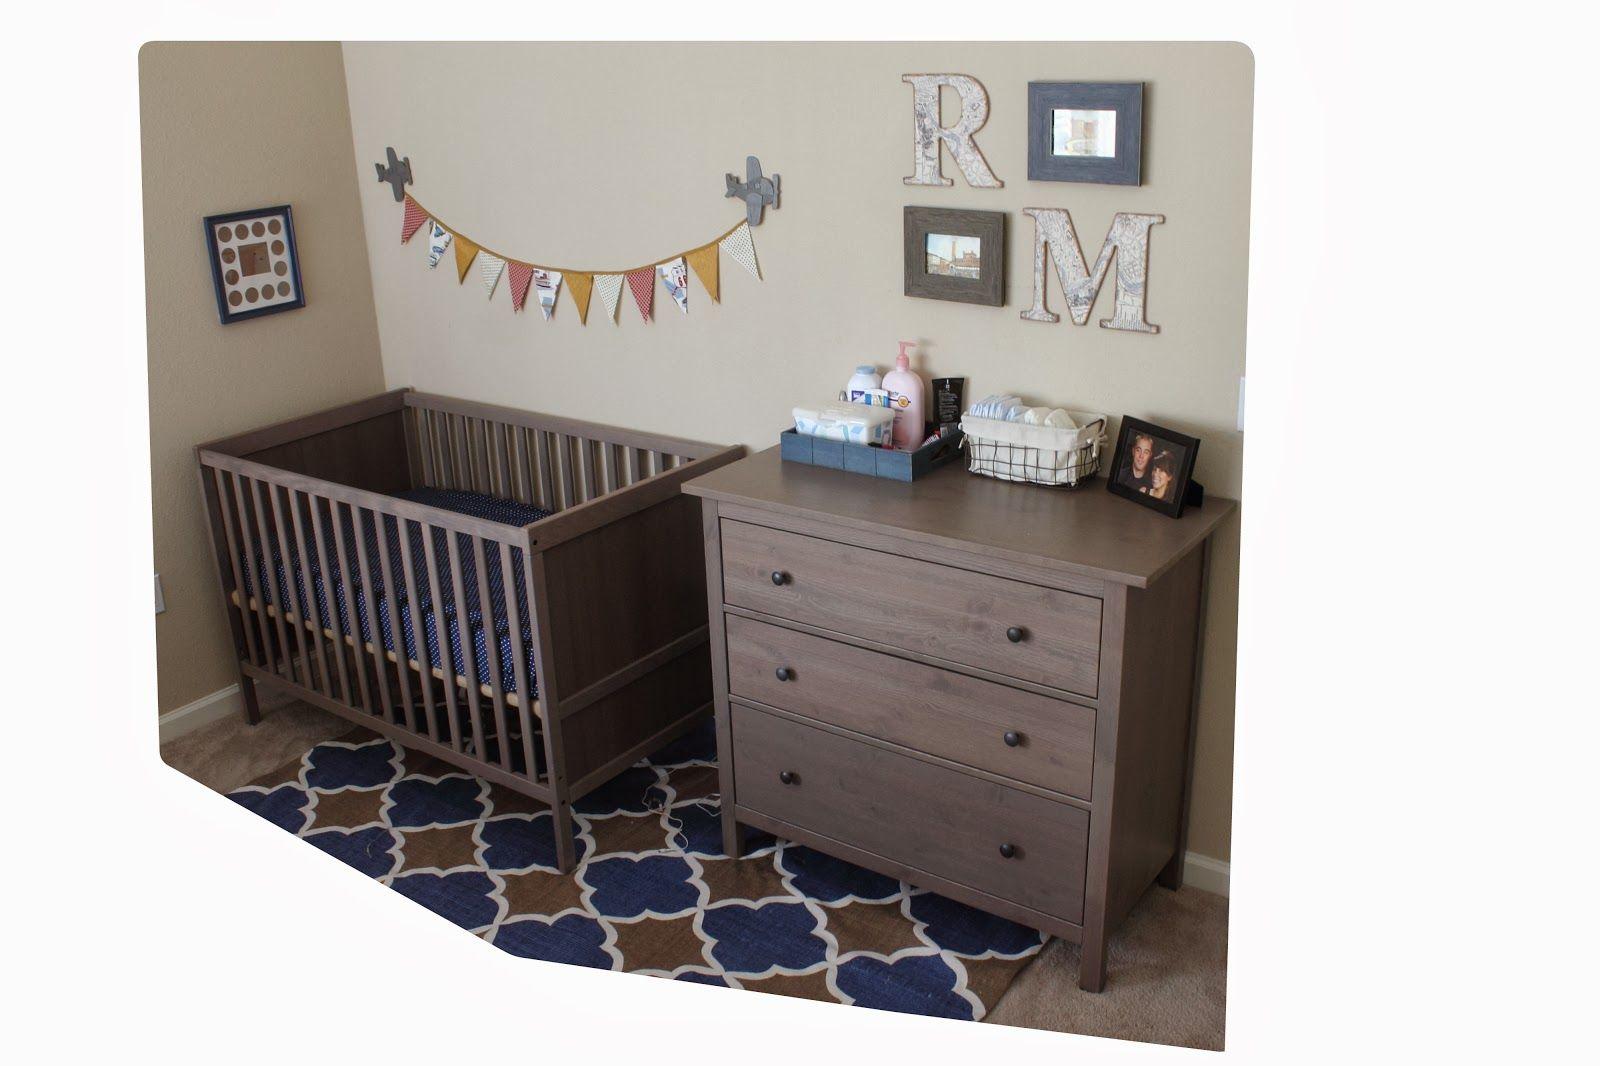 Ikea babyzimmer ~ Little boys nursery. little mans cozy little nook. travel theme